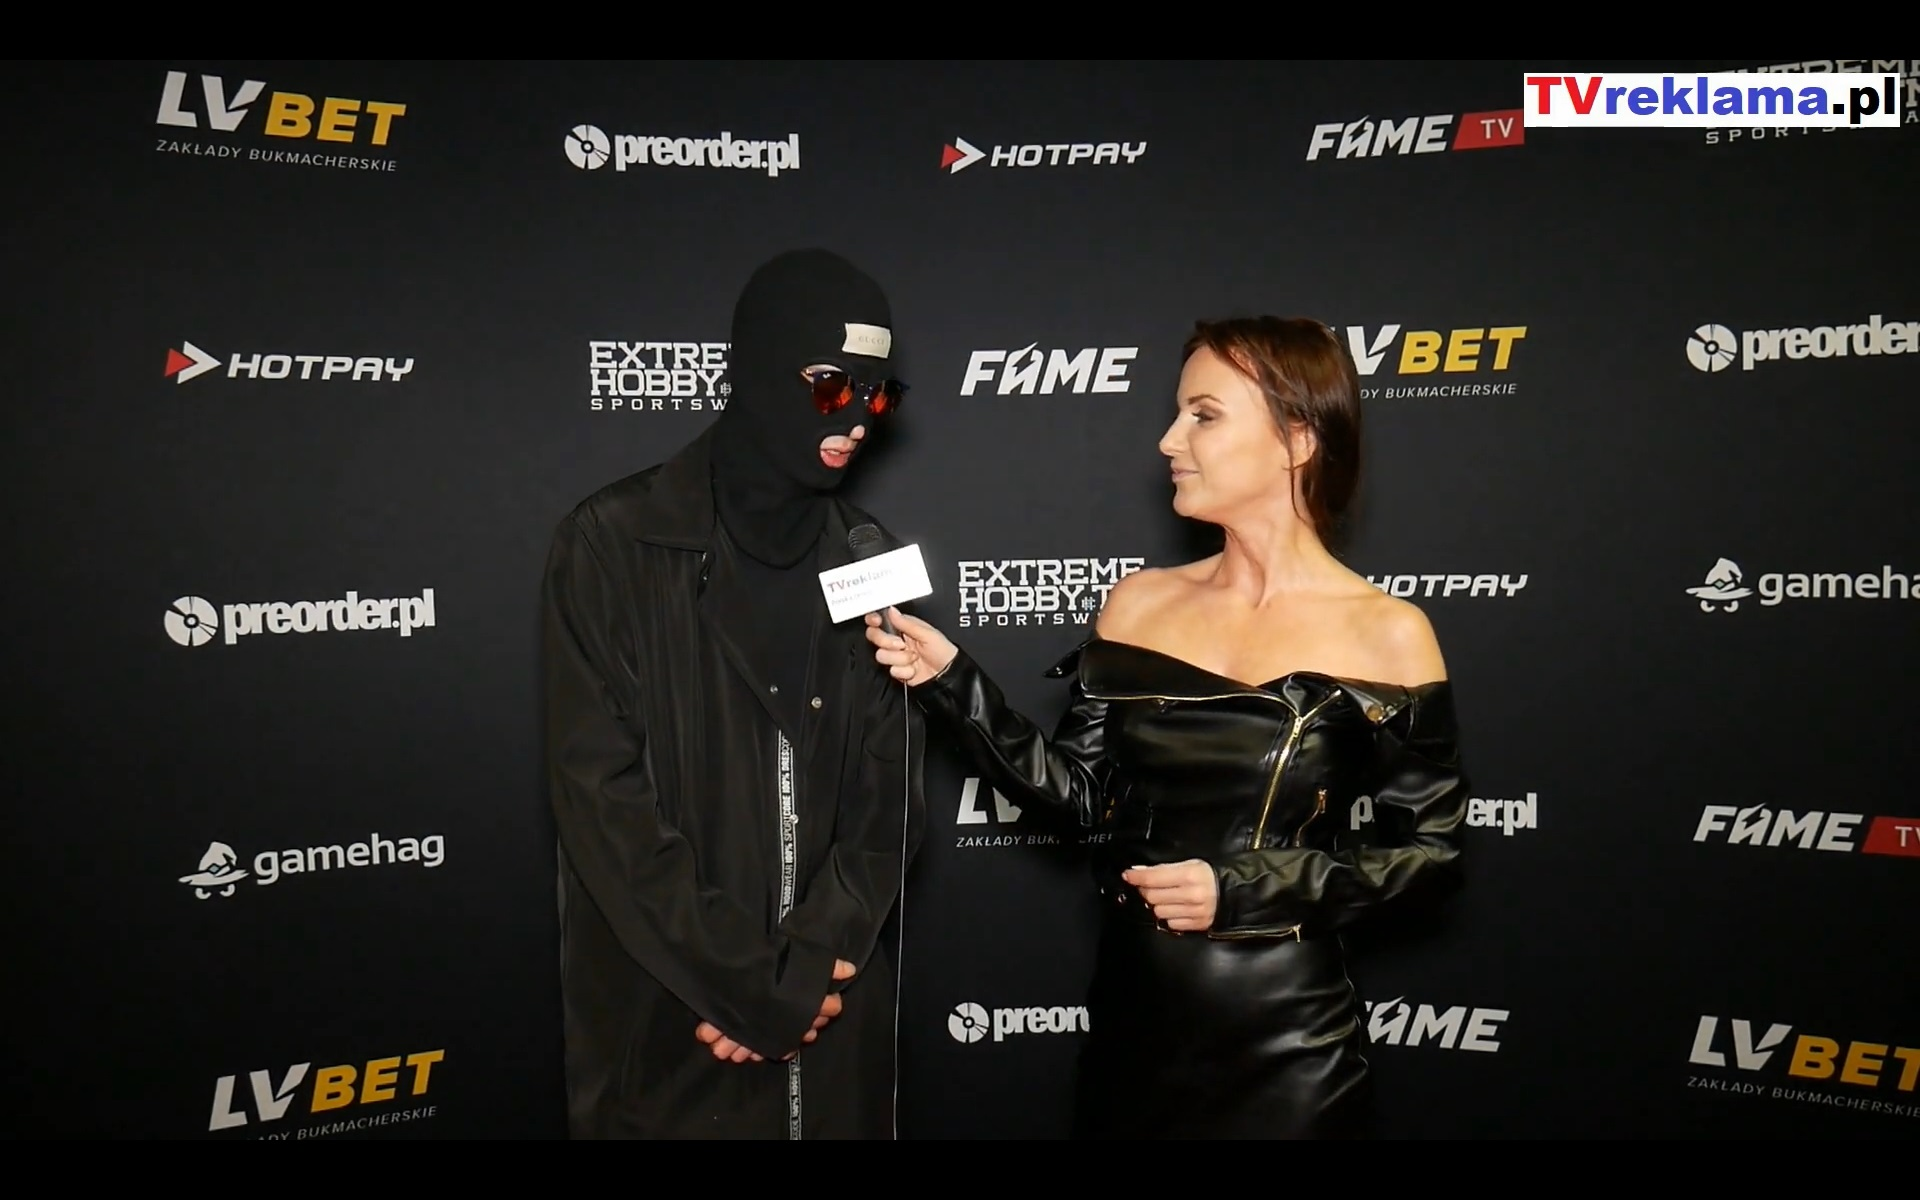 kamerzysta przed koncertem na Fame mma 3 – Koncert kamerzysty